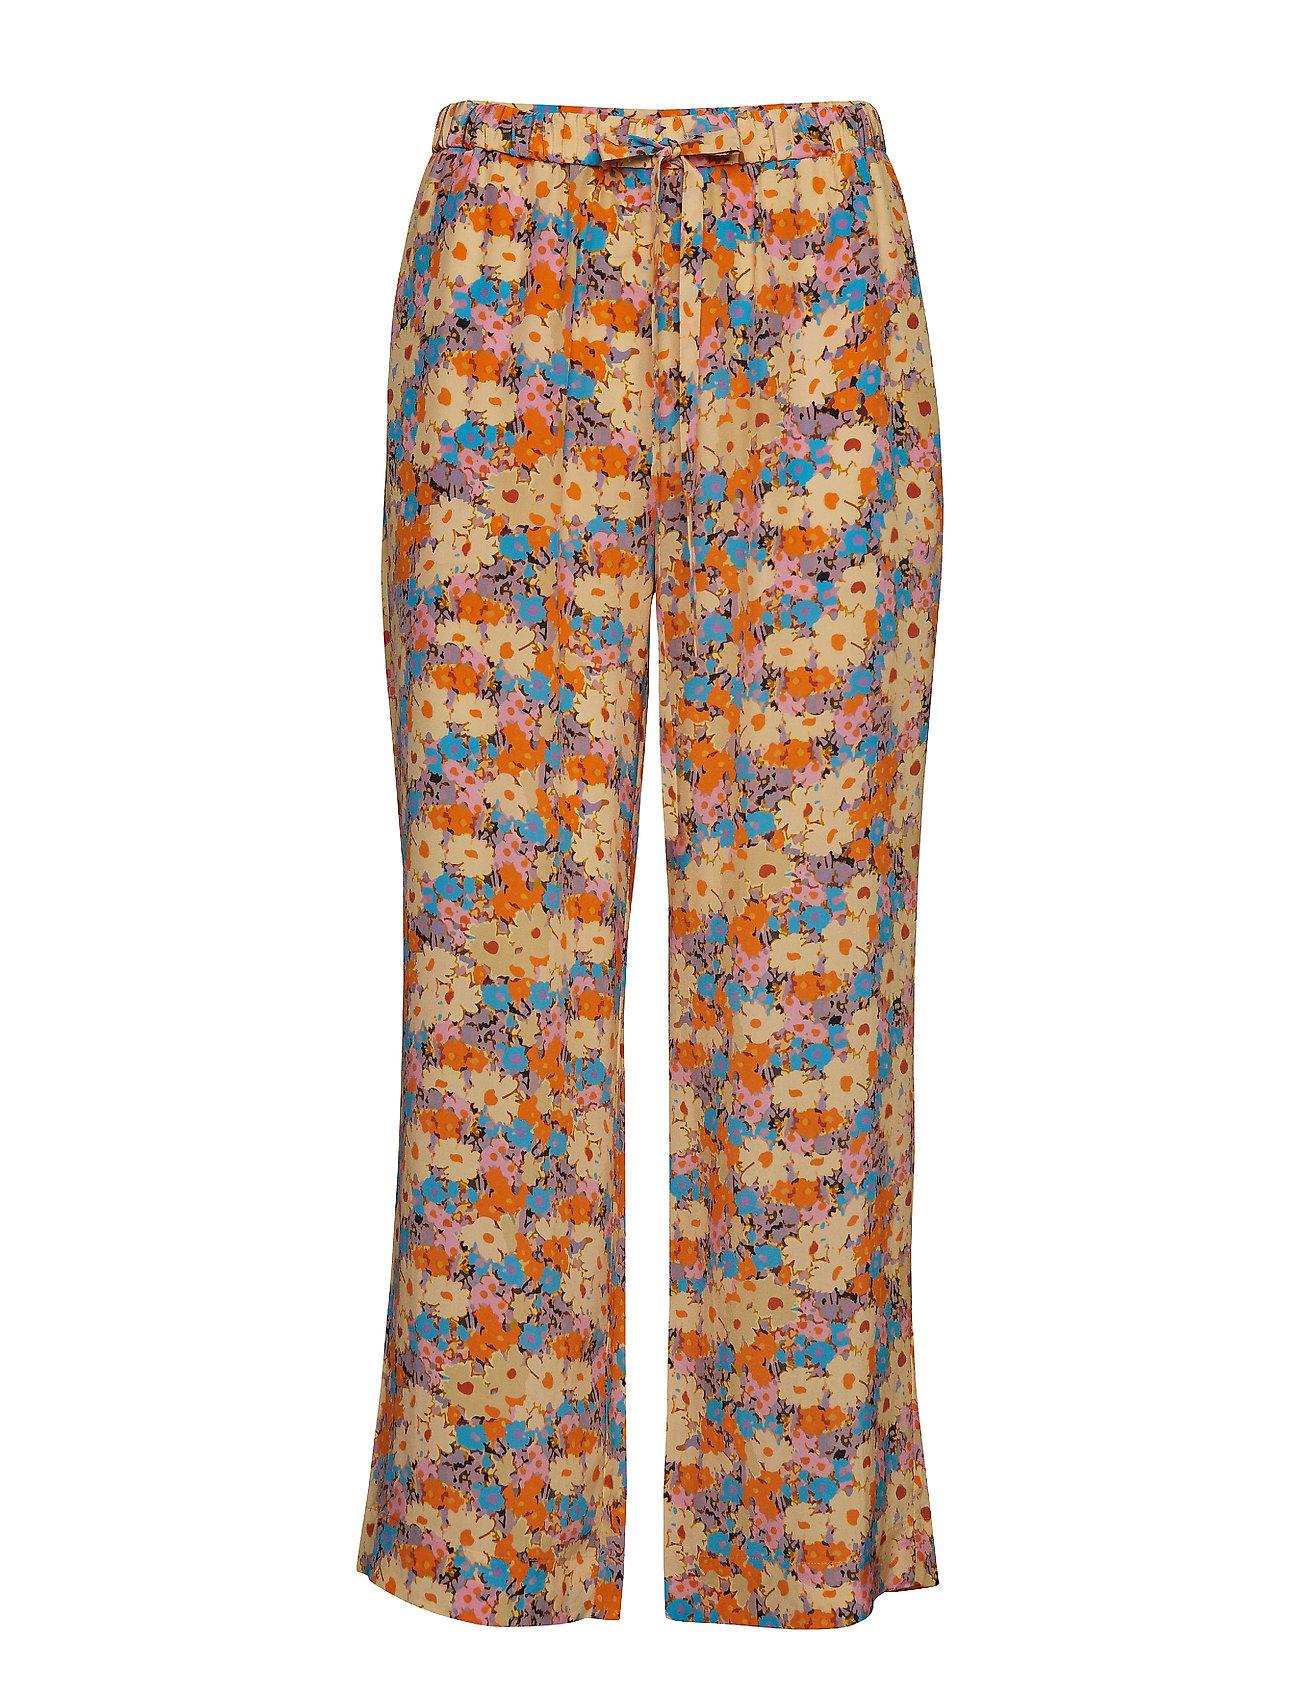 STINE GOYA Truman, 567 Flowers Silk